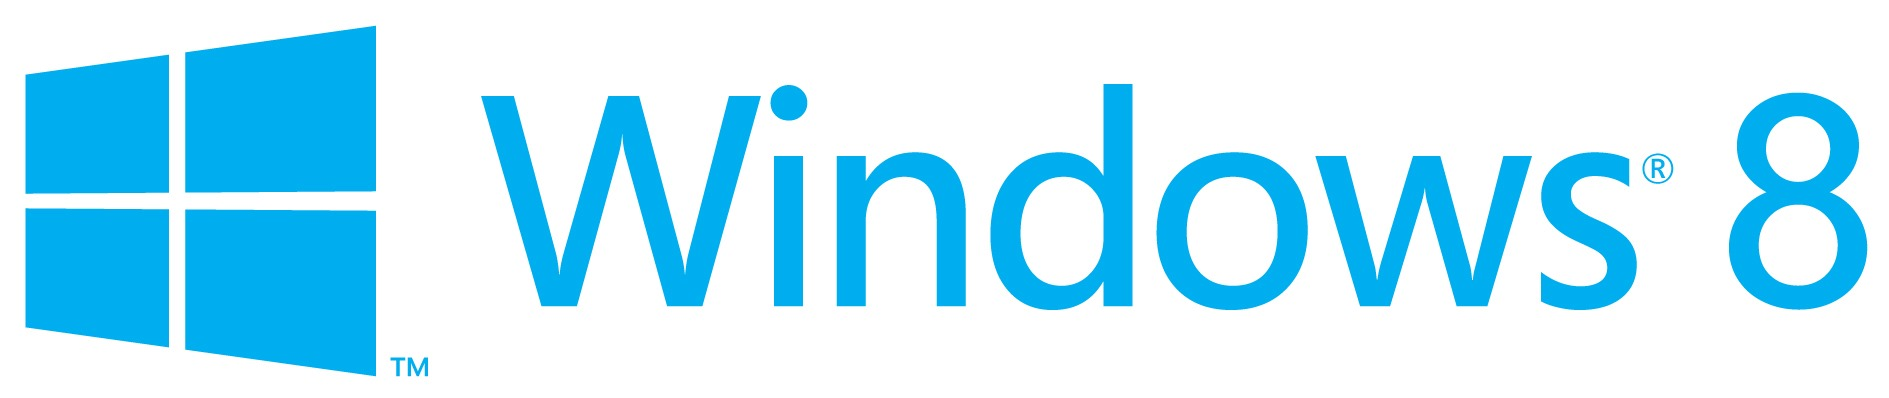 100 mln licencji Windows 8